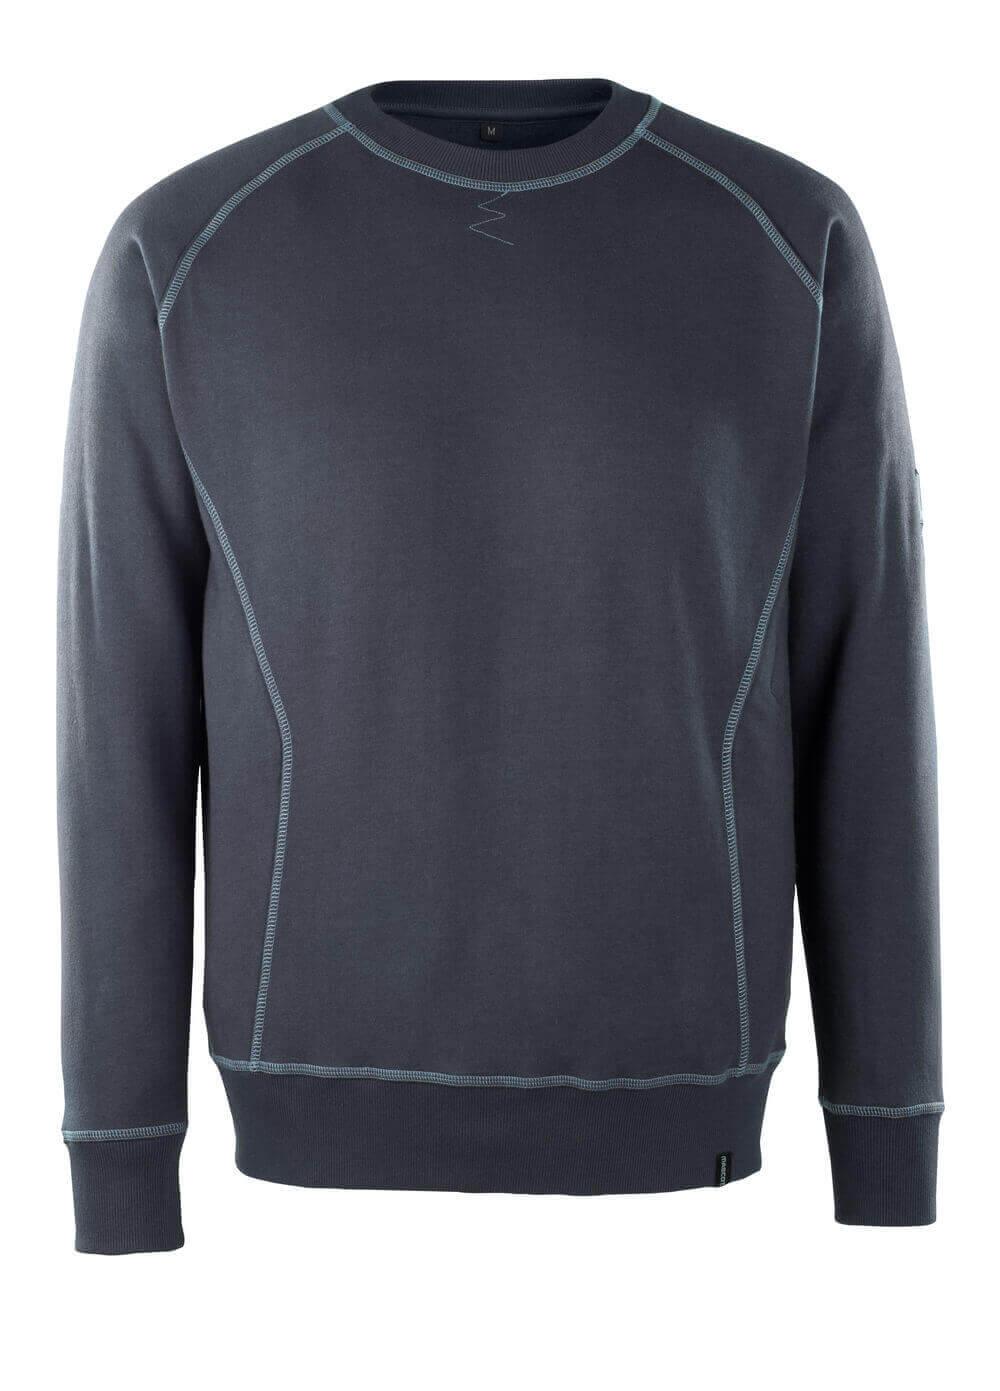 50120-928-010 Sweatshirt - Schwarzblau